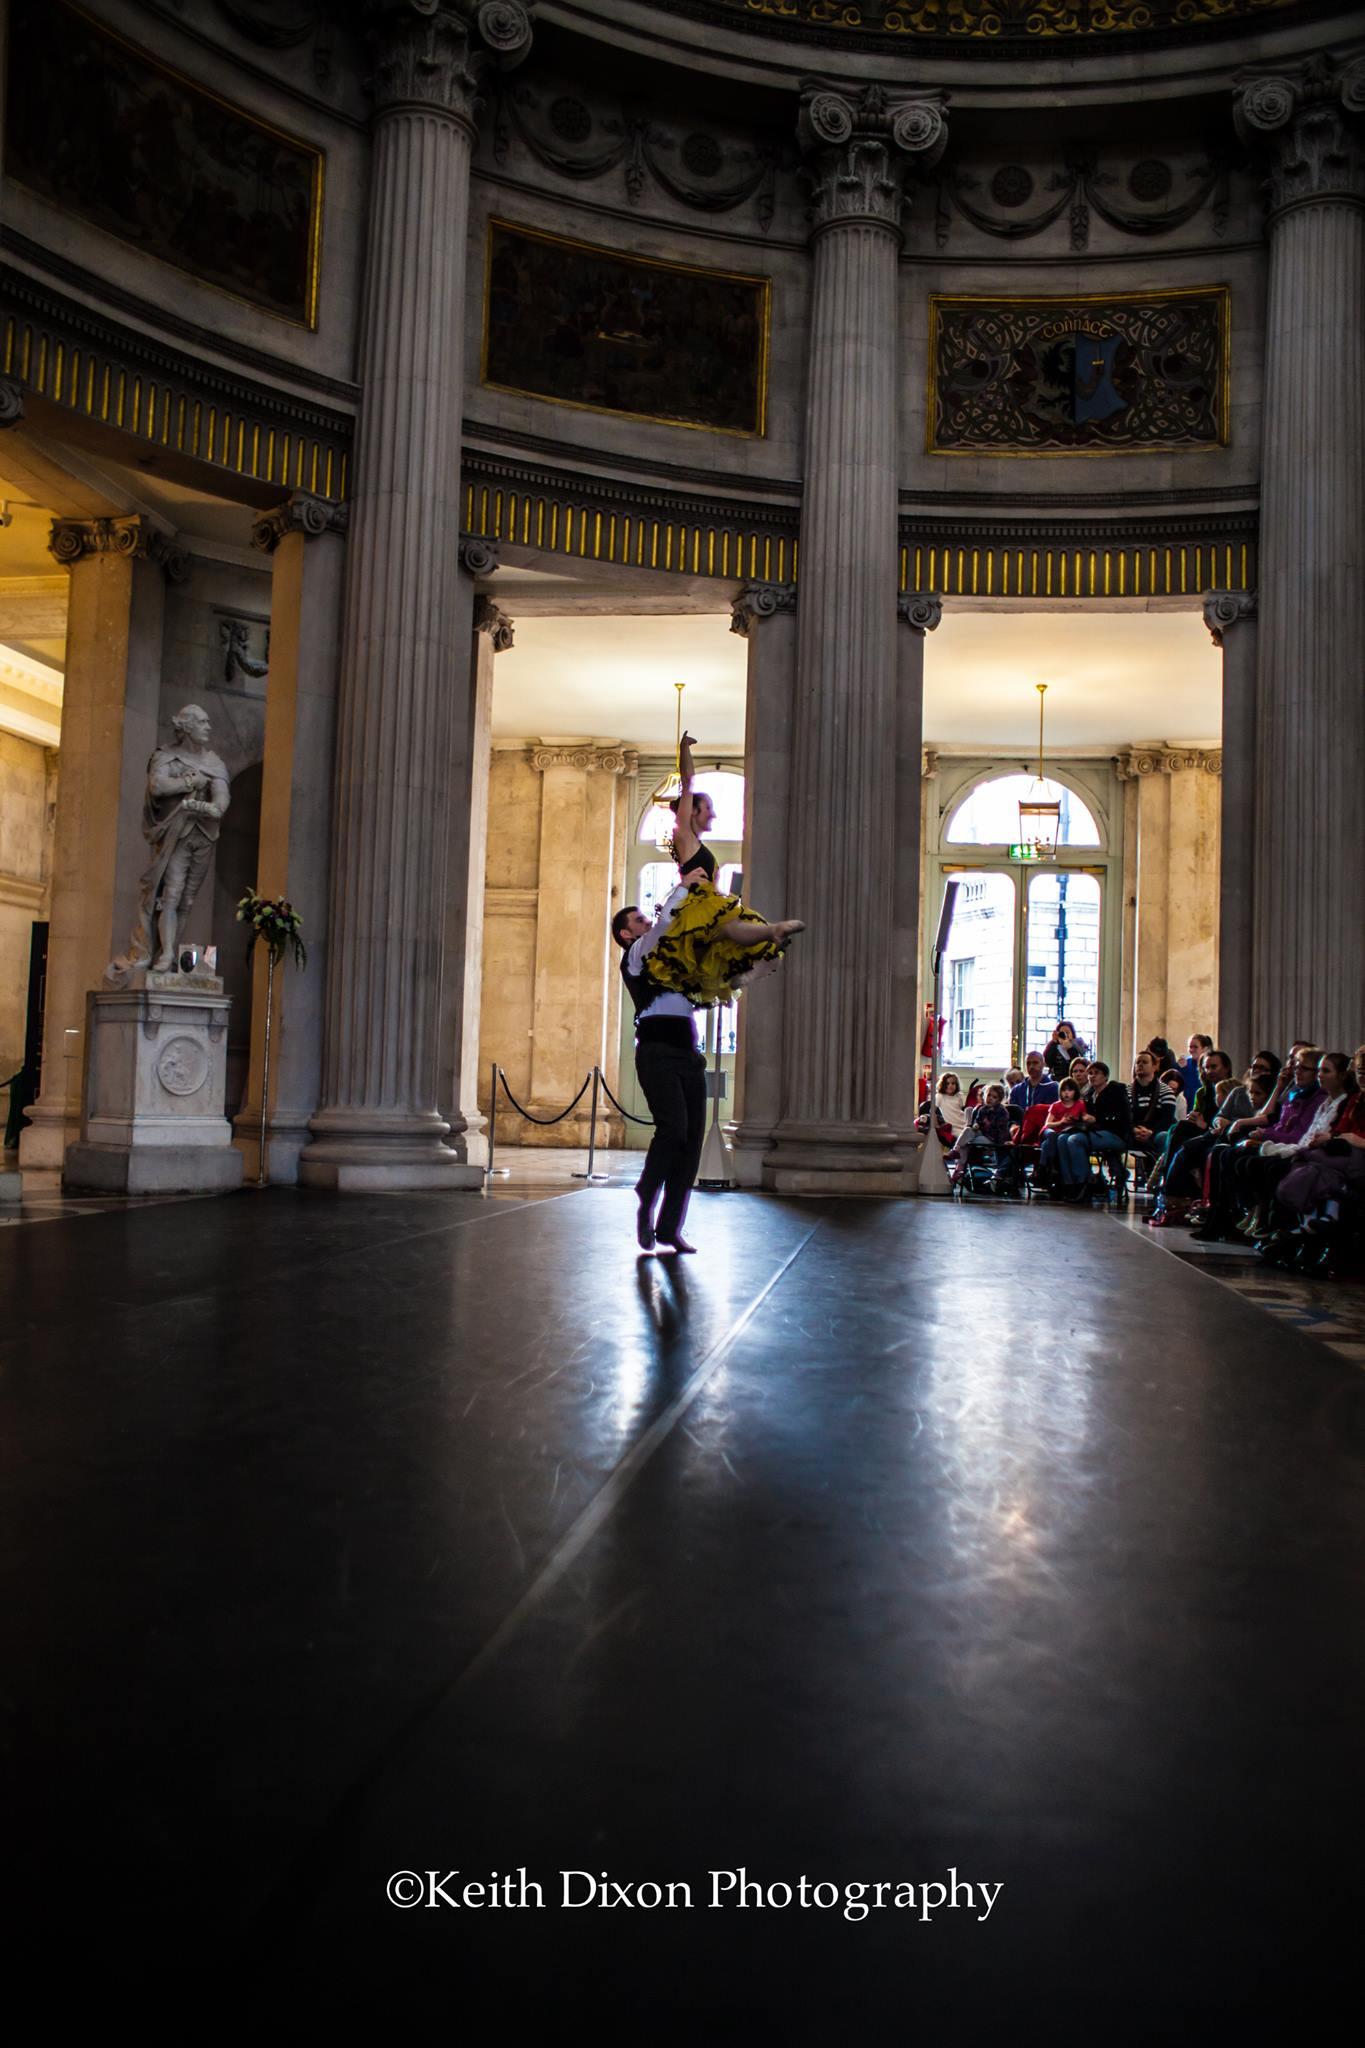 Rebecca and Turlough City Hall Performance